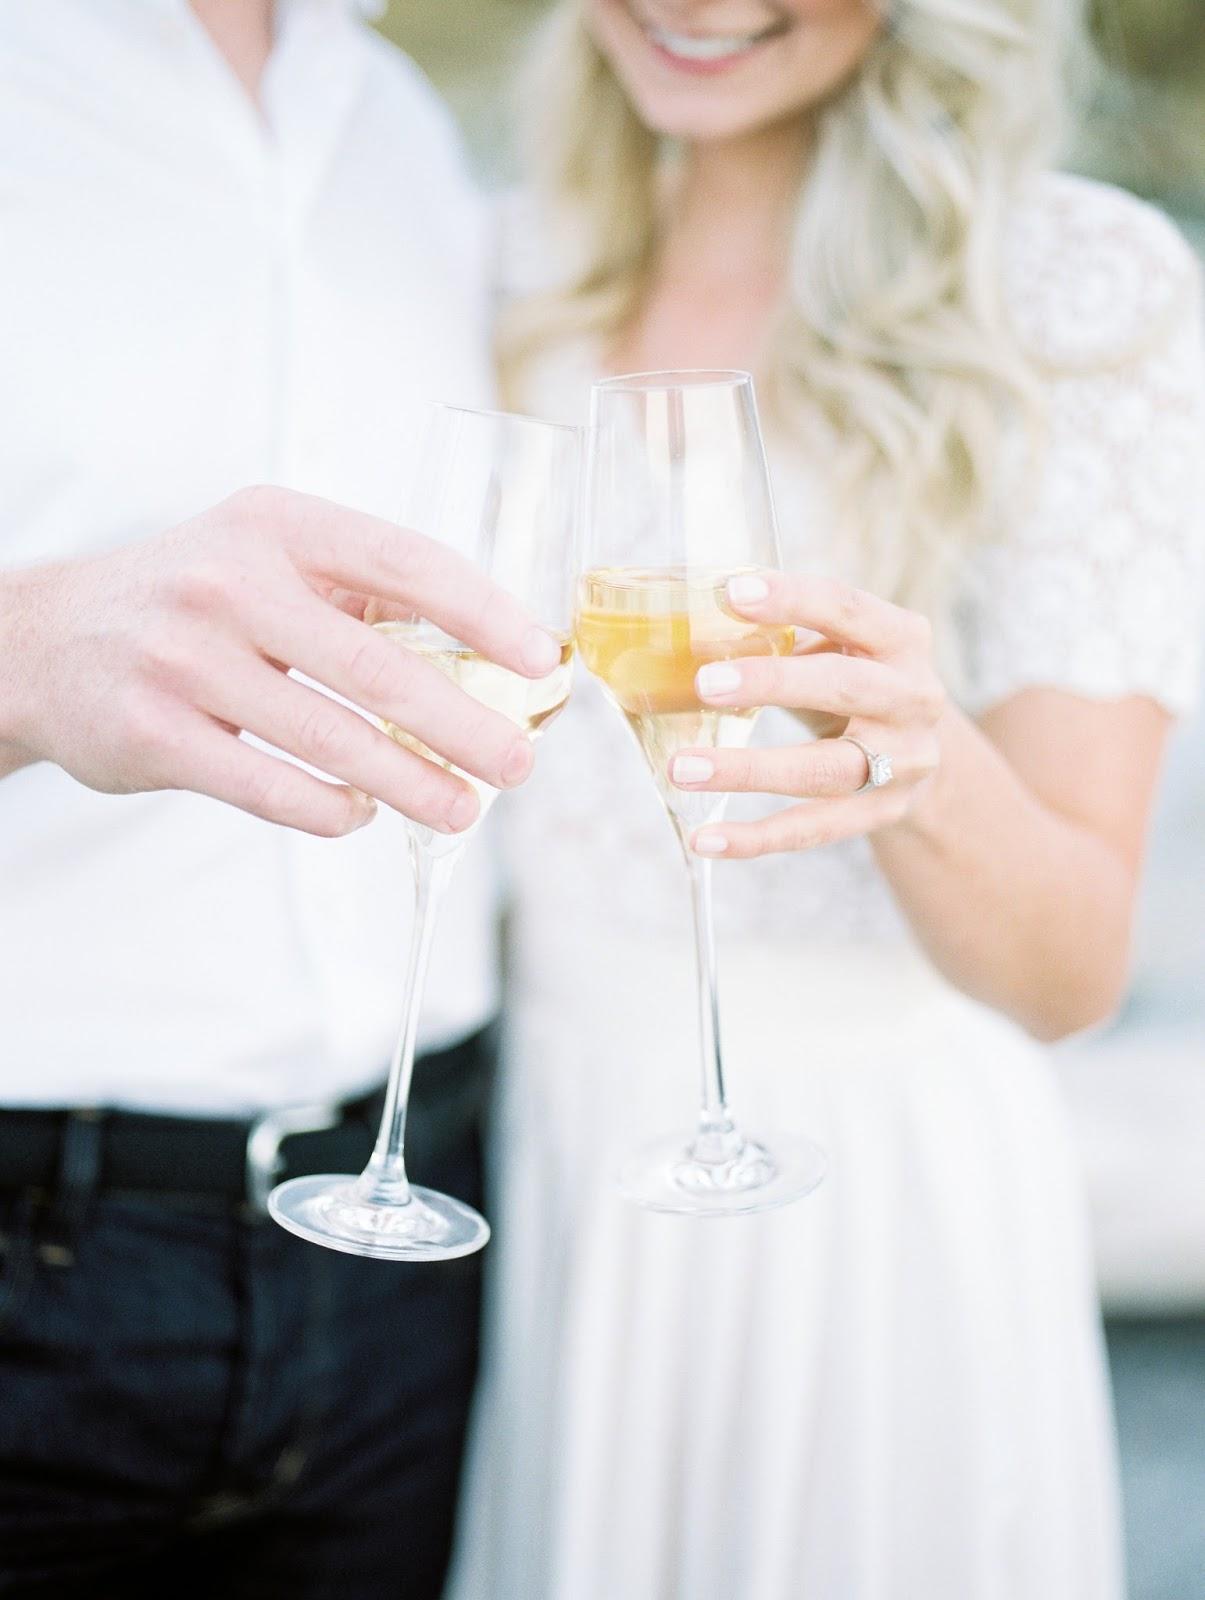 champagne glasses clink together